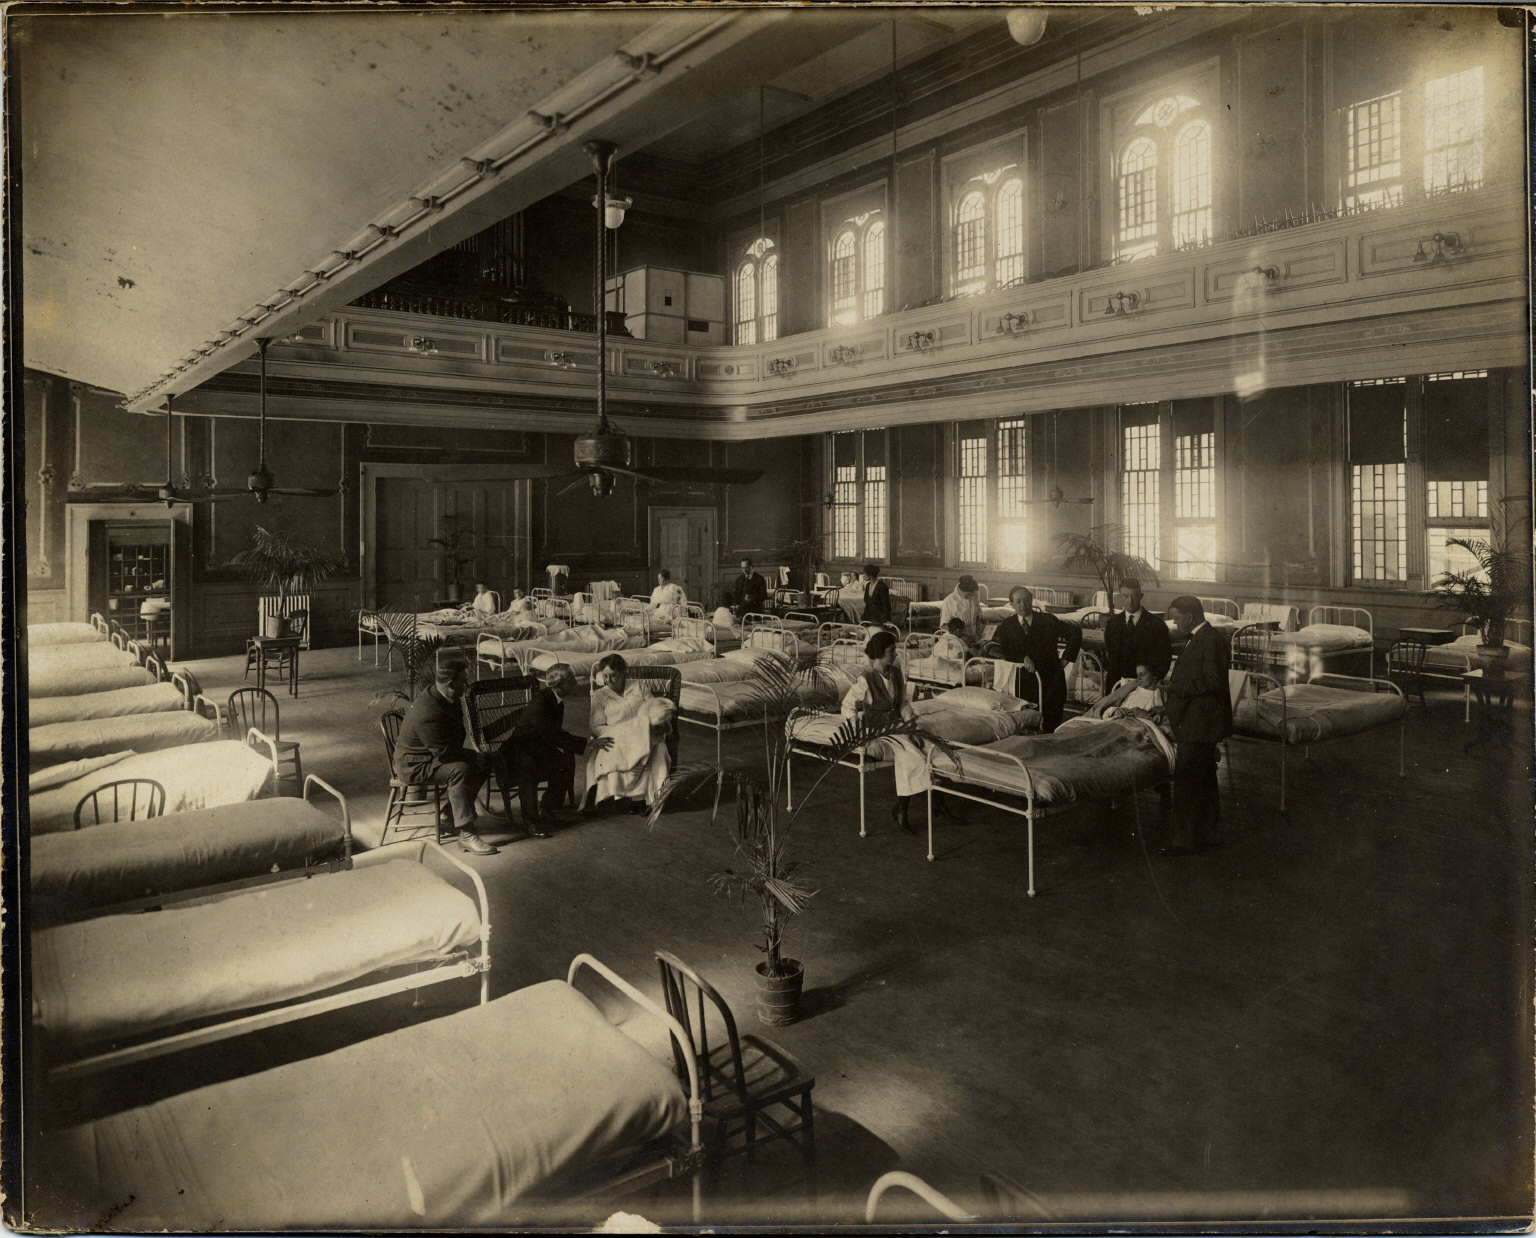 Knights of Columbus convalescent hospital